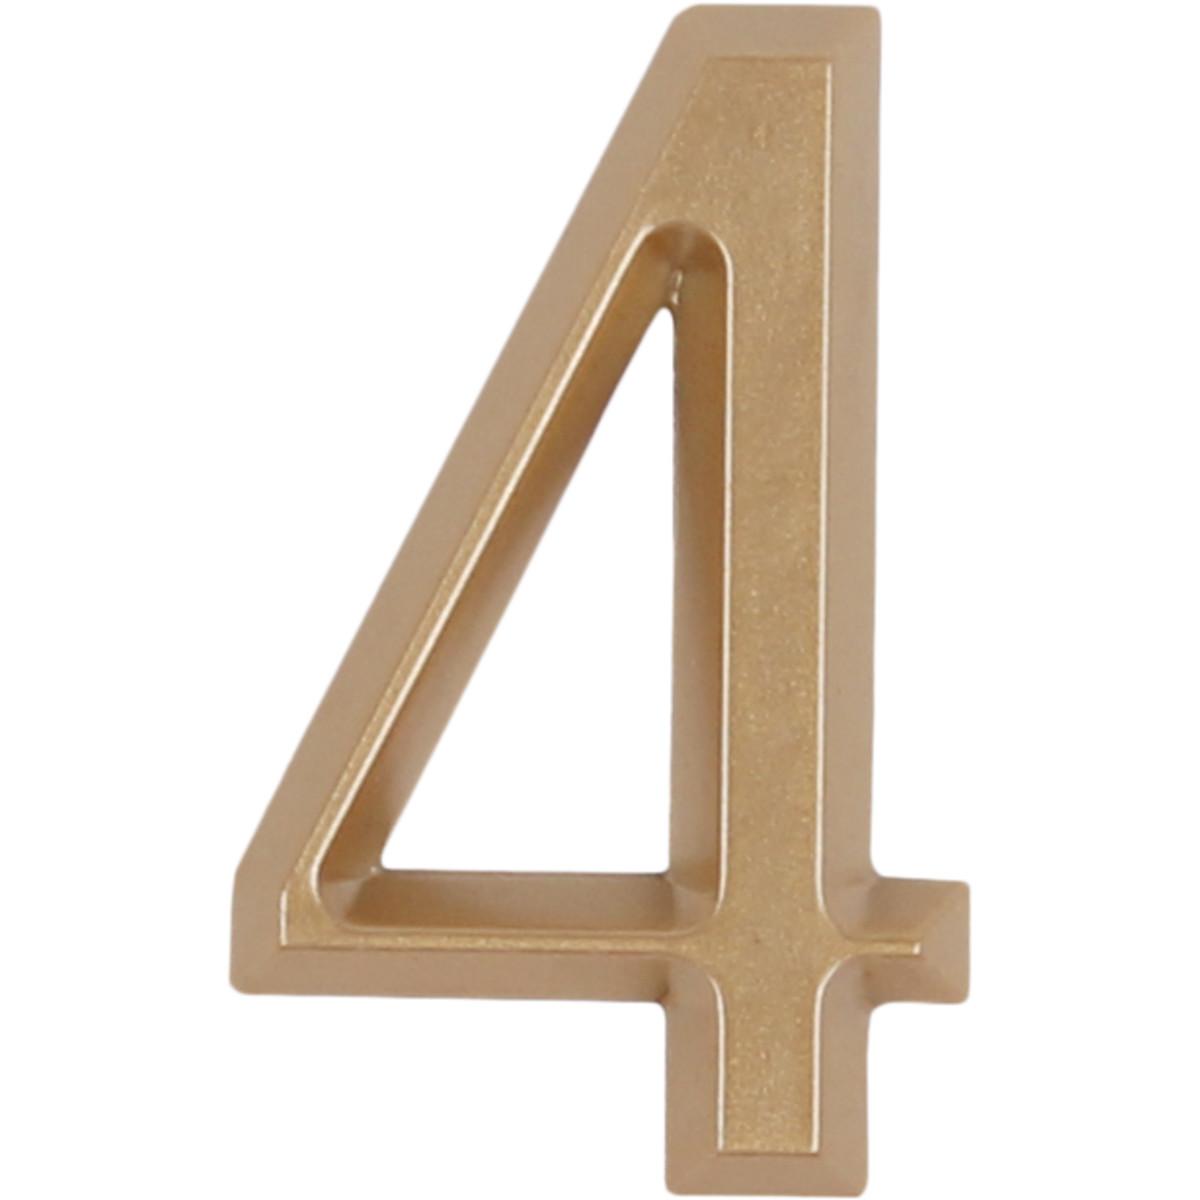 Цифра «4» Larvij самоклеящаяся 60х37 мм пластик цвет матовое золото